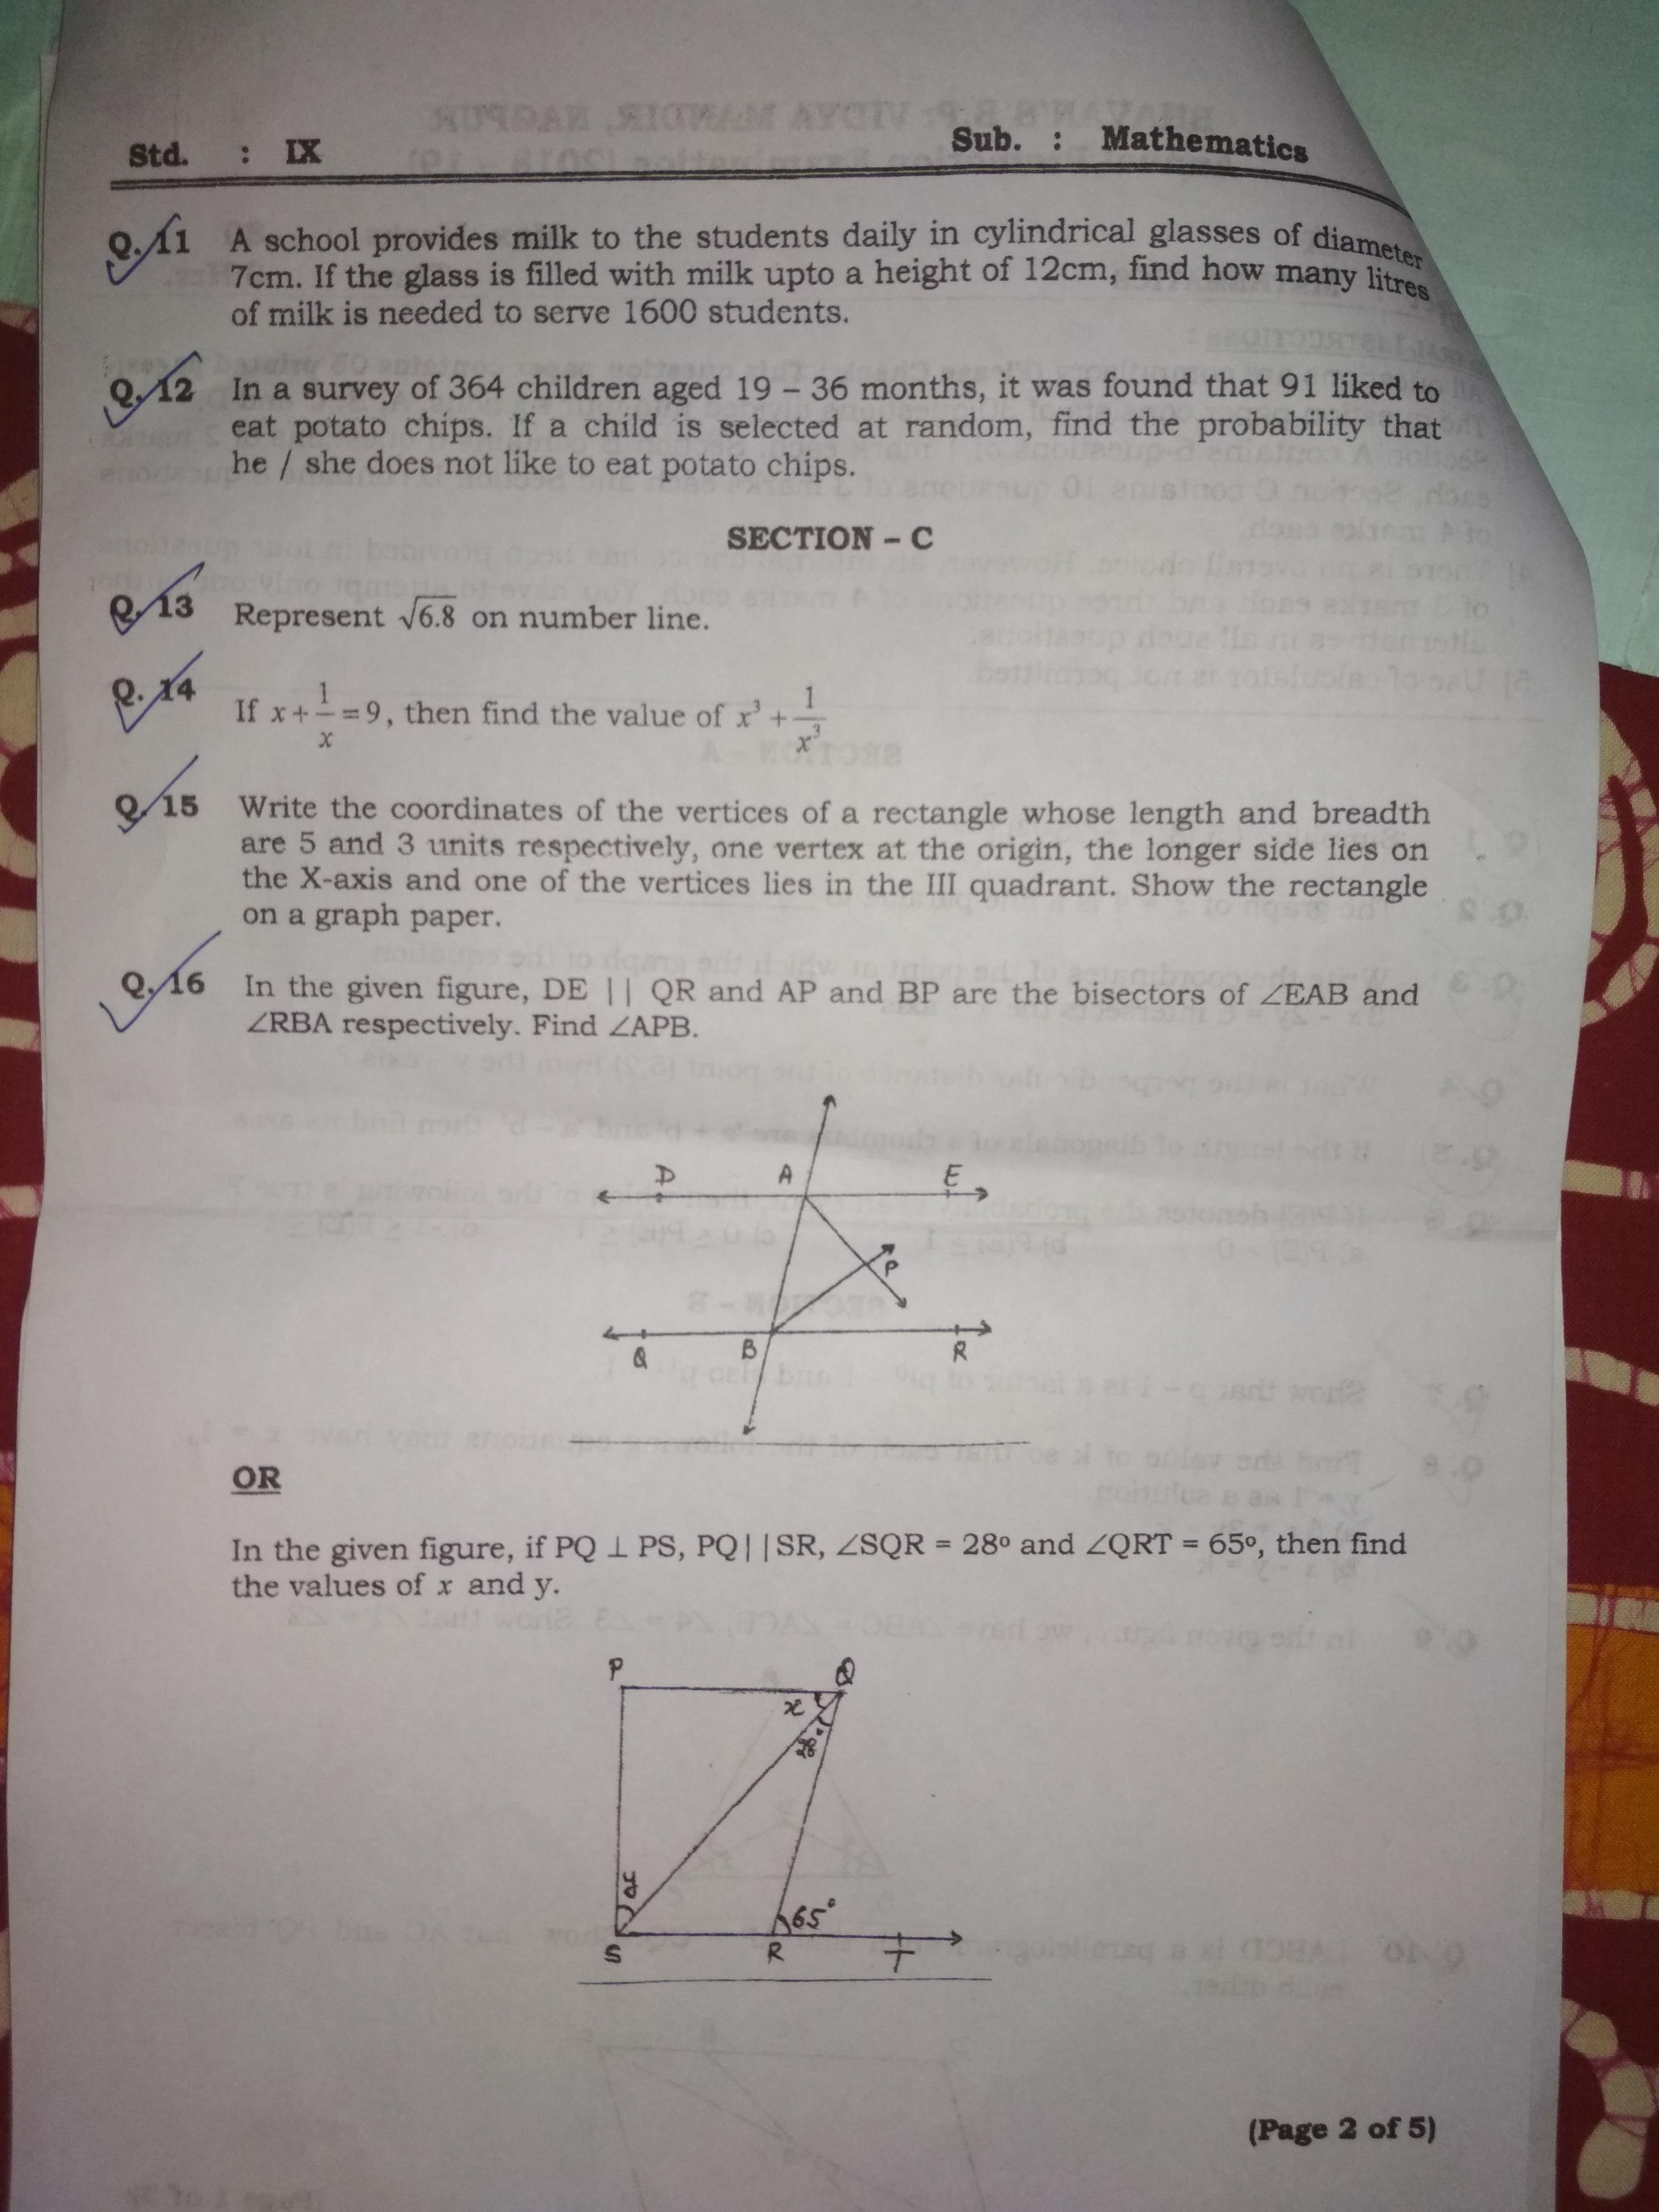 Solve this question paper maths for final exam  (NCERT CLASS